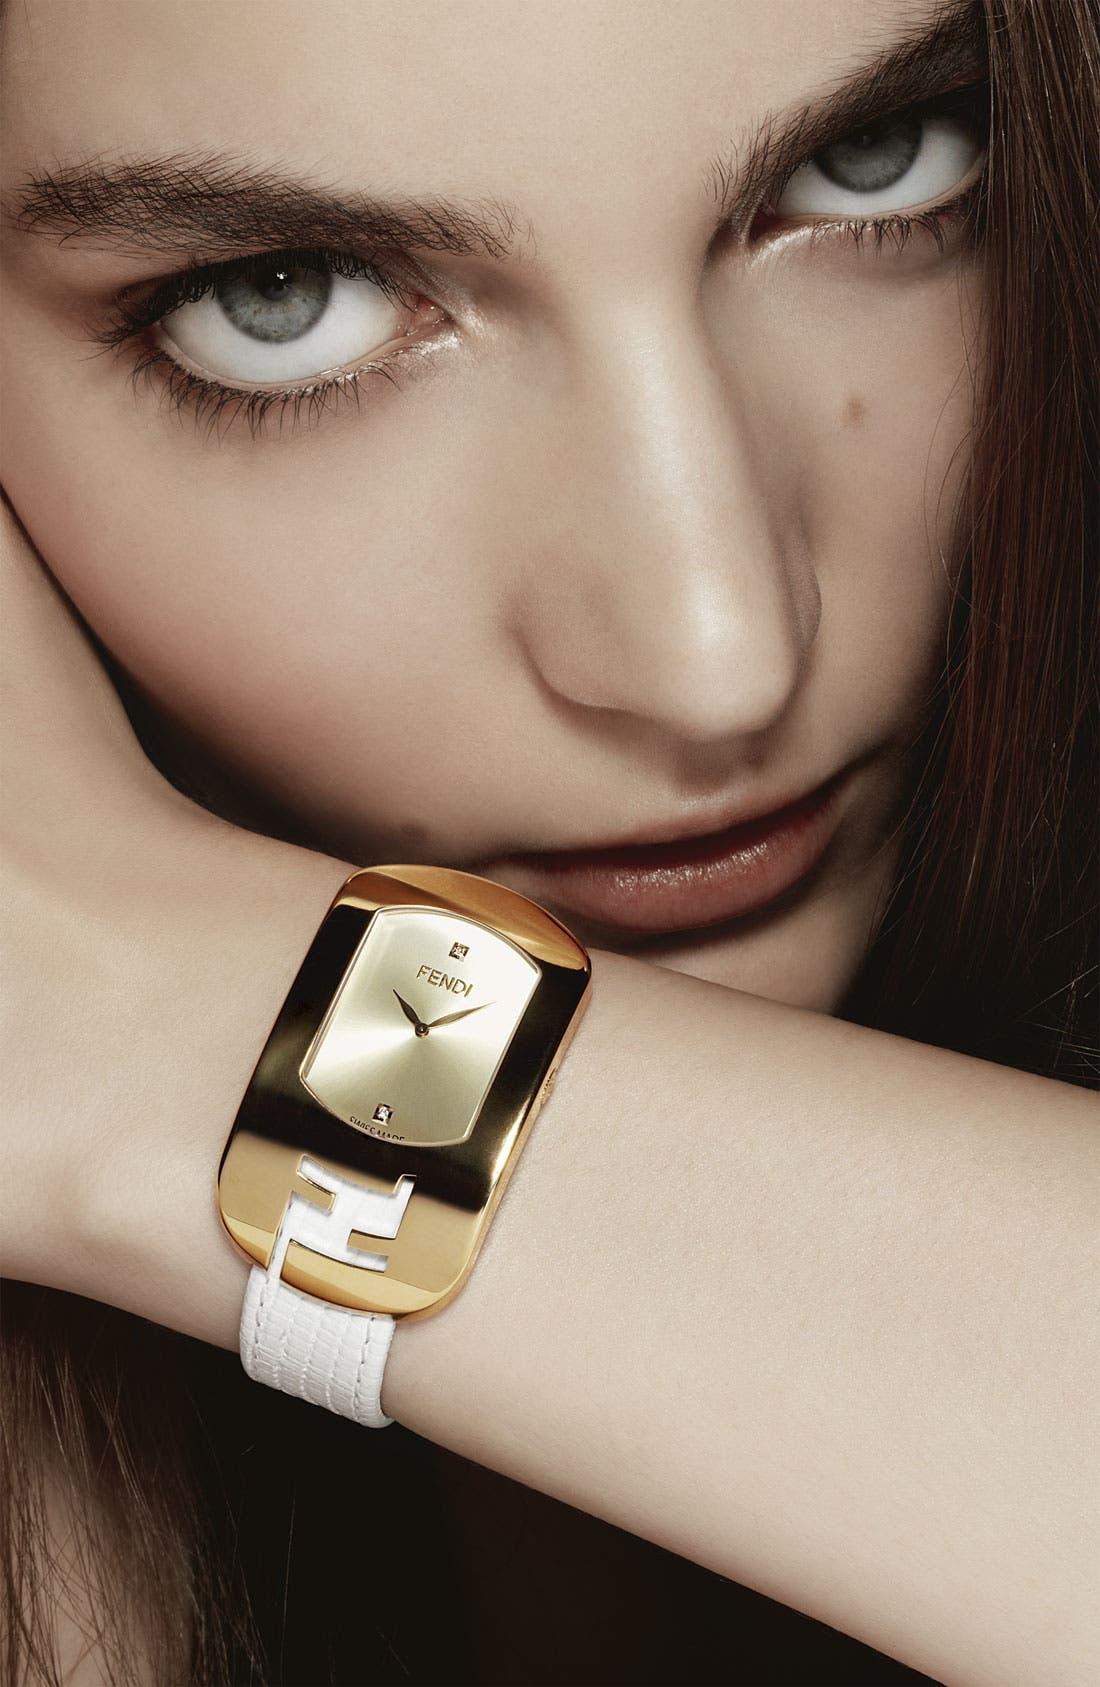 Alternate Image 2  - Fendi 'Large Chameleon' Leather Strap Watch, 29mm x 49mm (Nordstrom Exclusive)